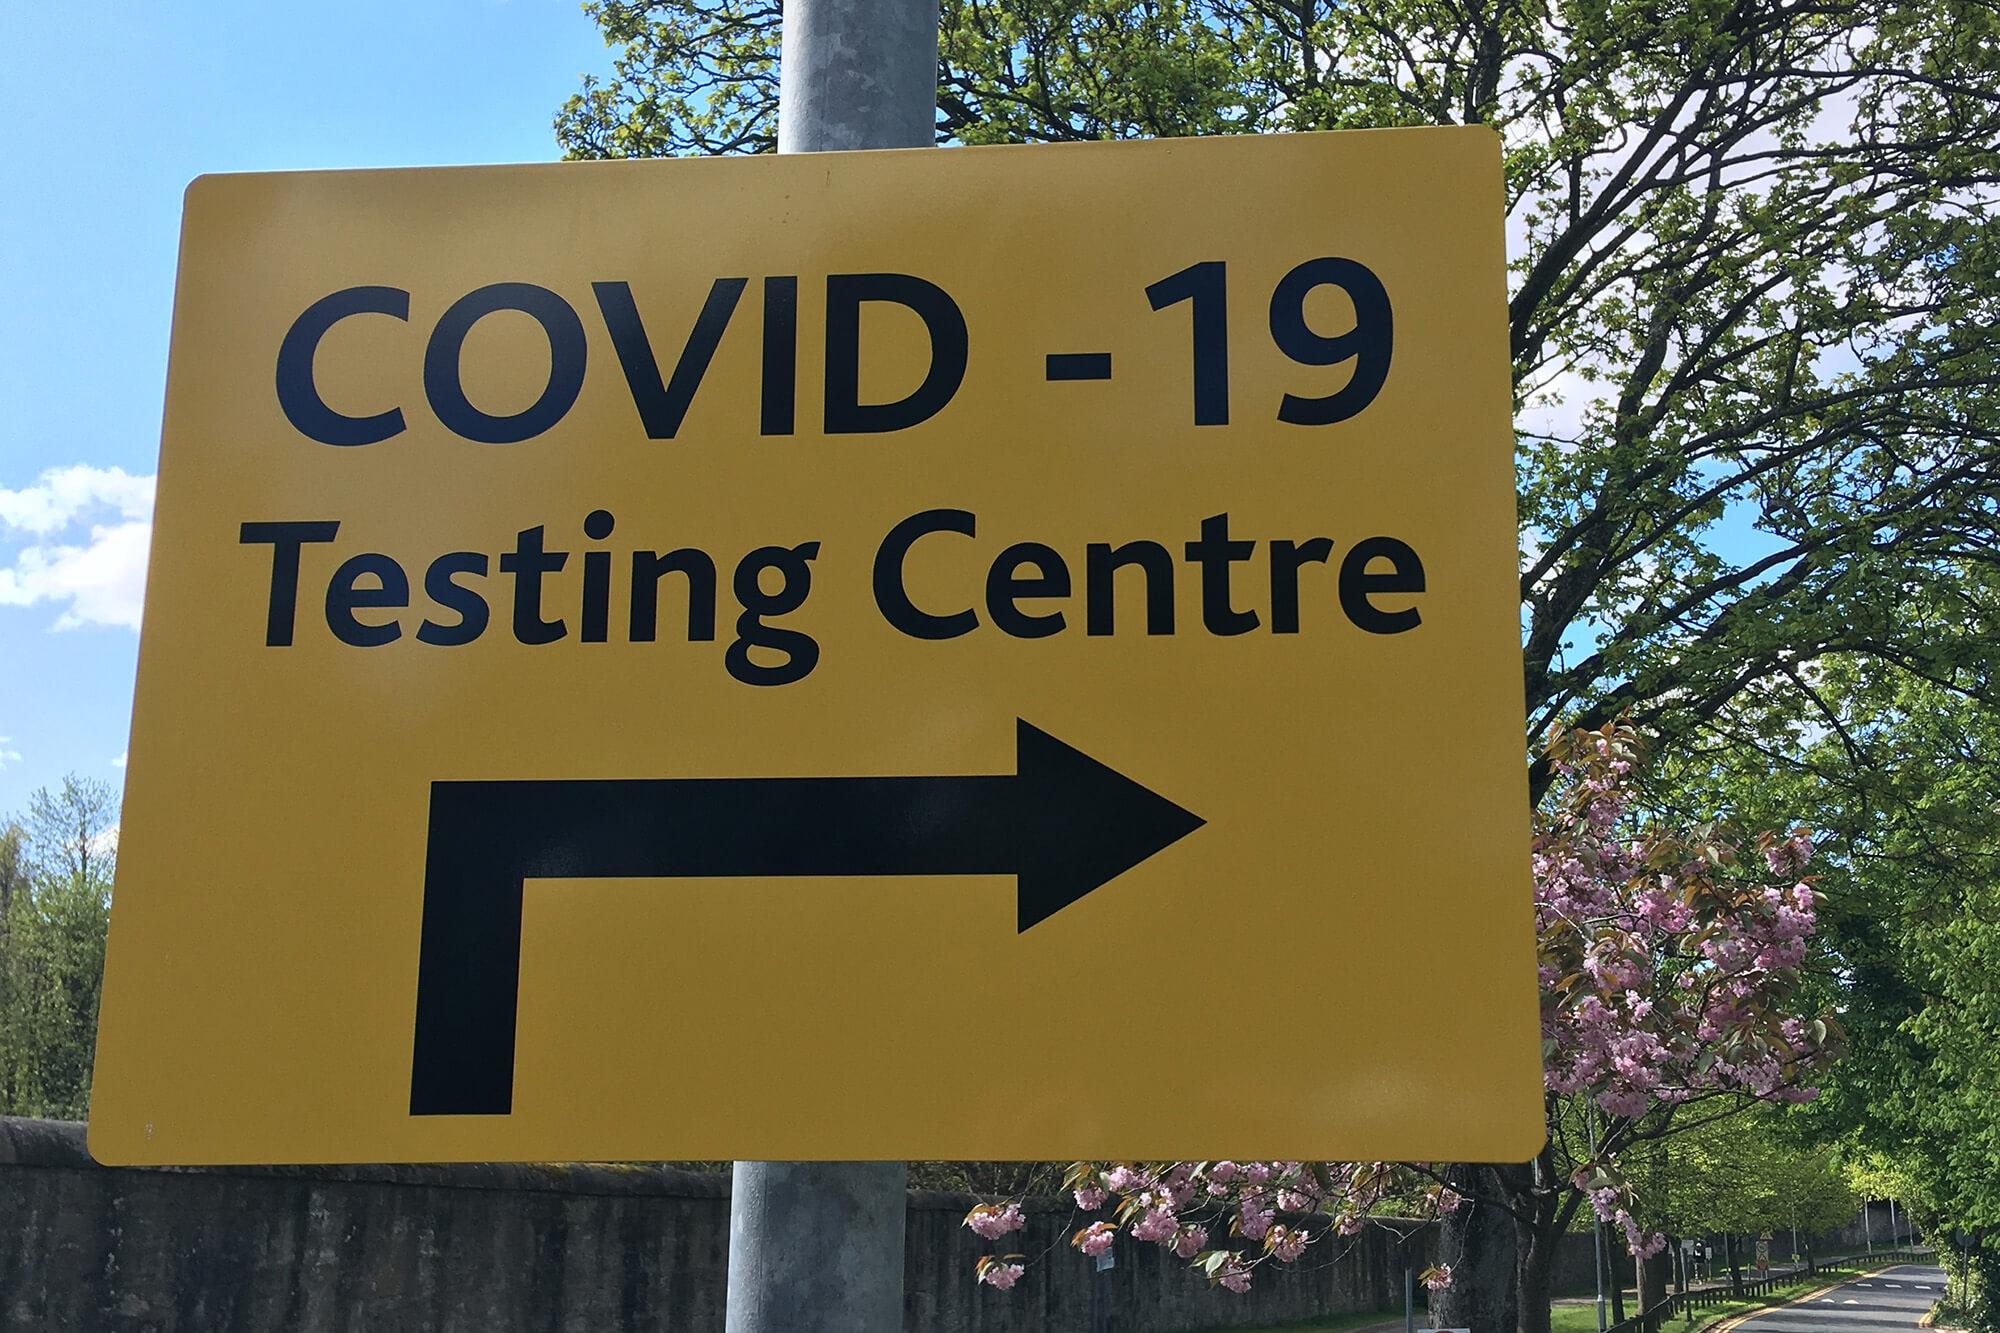 A covid testing centre sign.